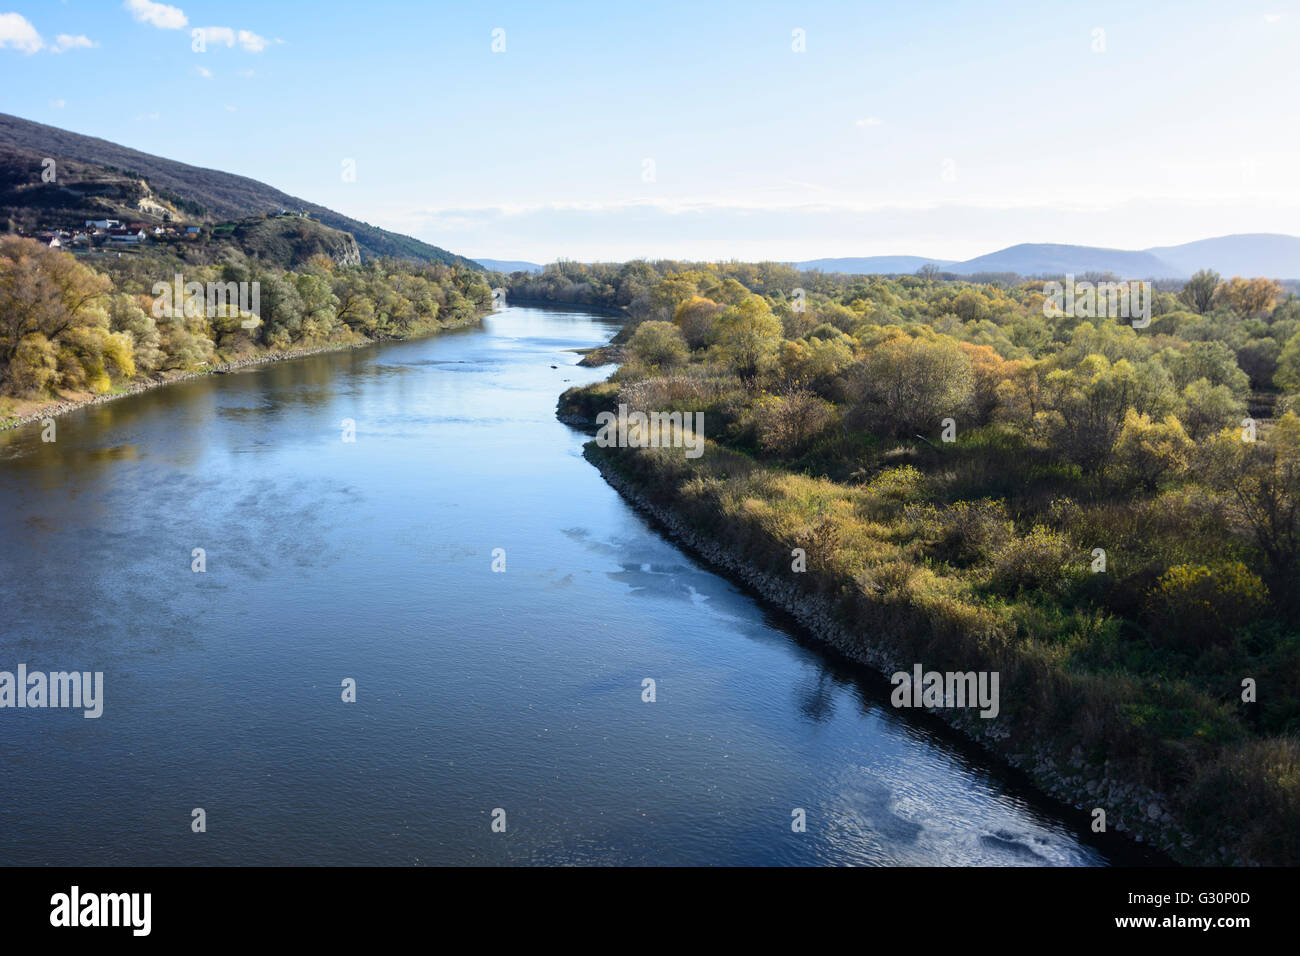 March (Morava) River , as seen from the bike Freedom Bridge southbound, Austria, Niederösterreich, Lower Austria, - Stock Image